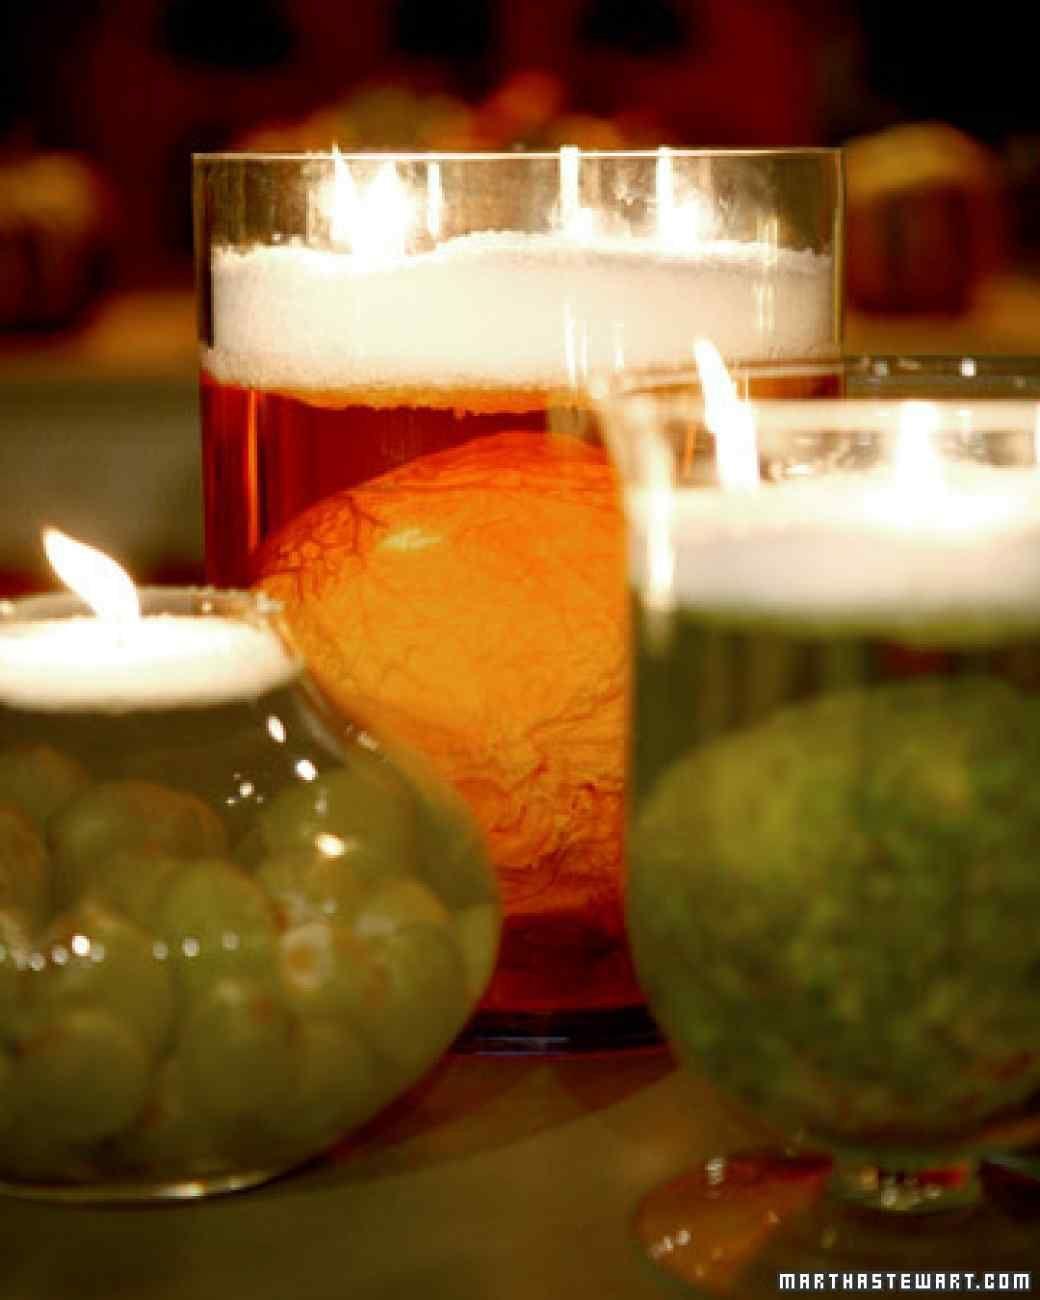 Specimen-Jar Candle Jar candle - cool homemade halloween decorations